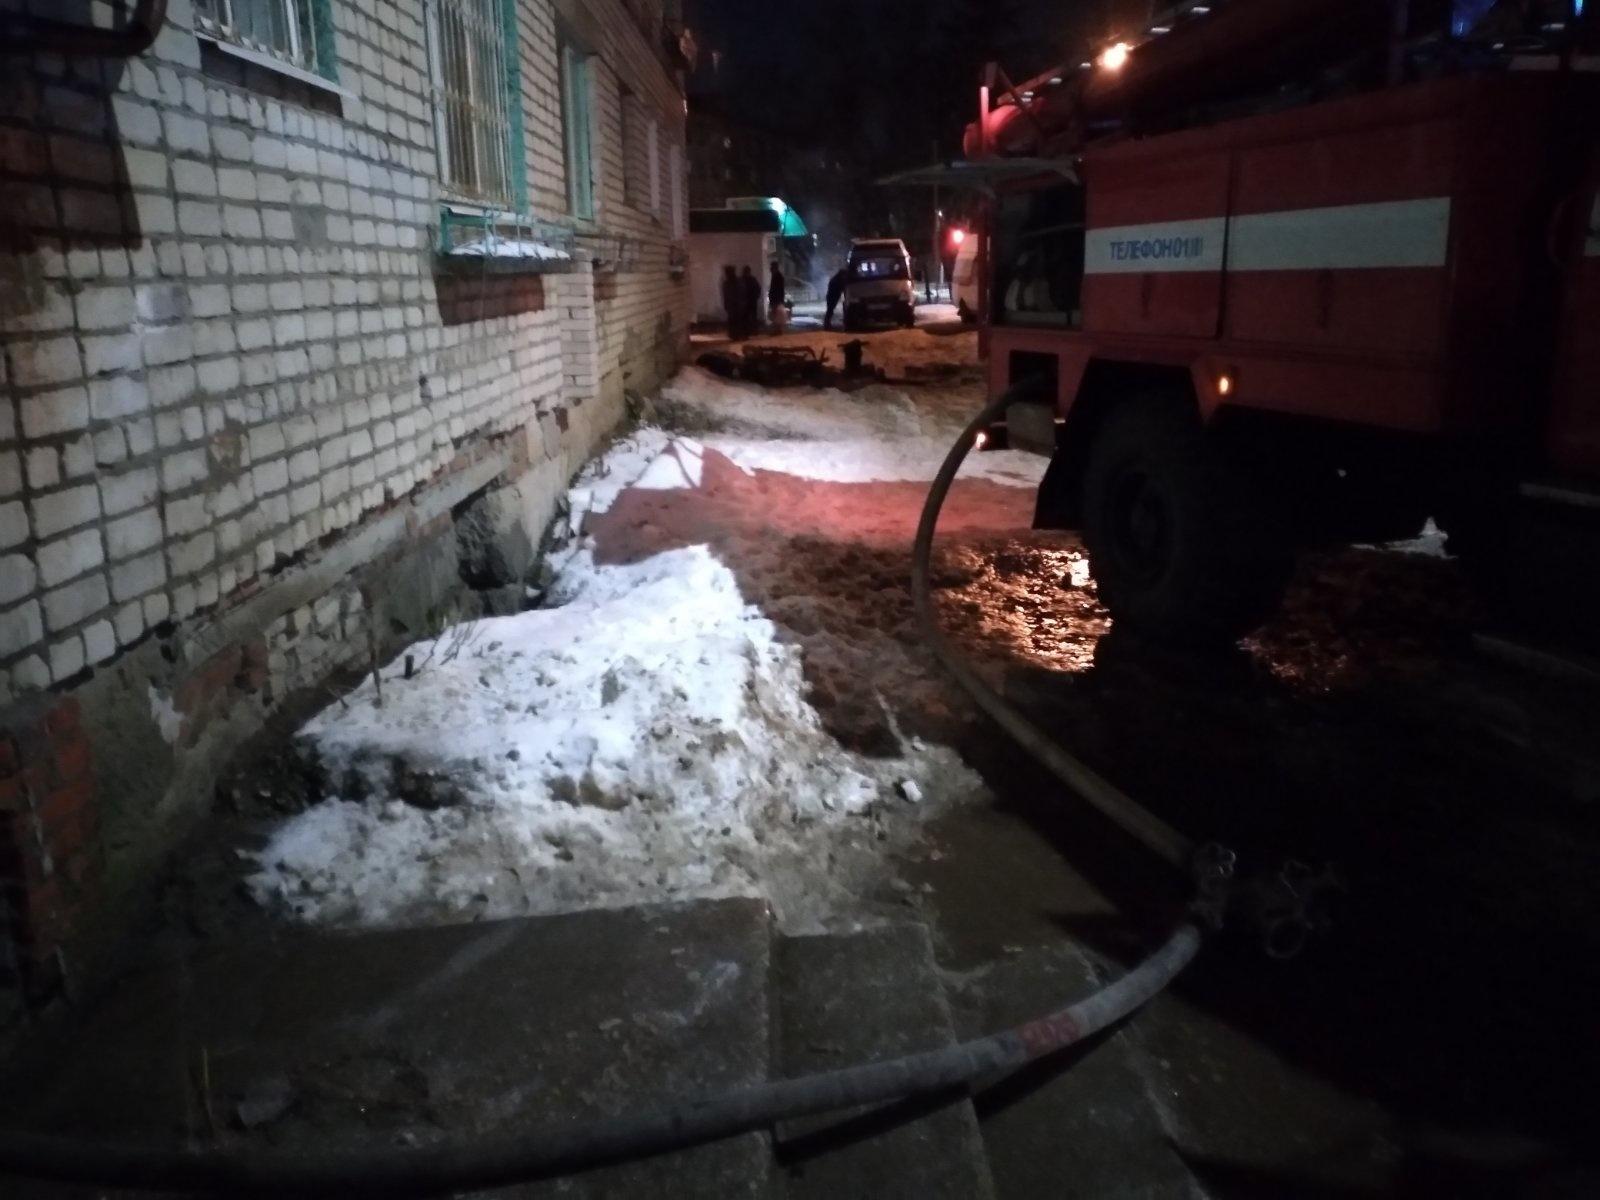 Пожар г. Гороховец, ул. Гагарина. д. 26, кв. 10